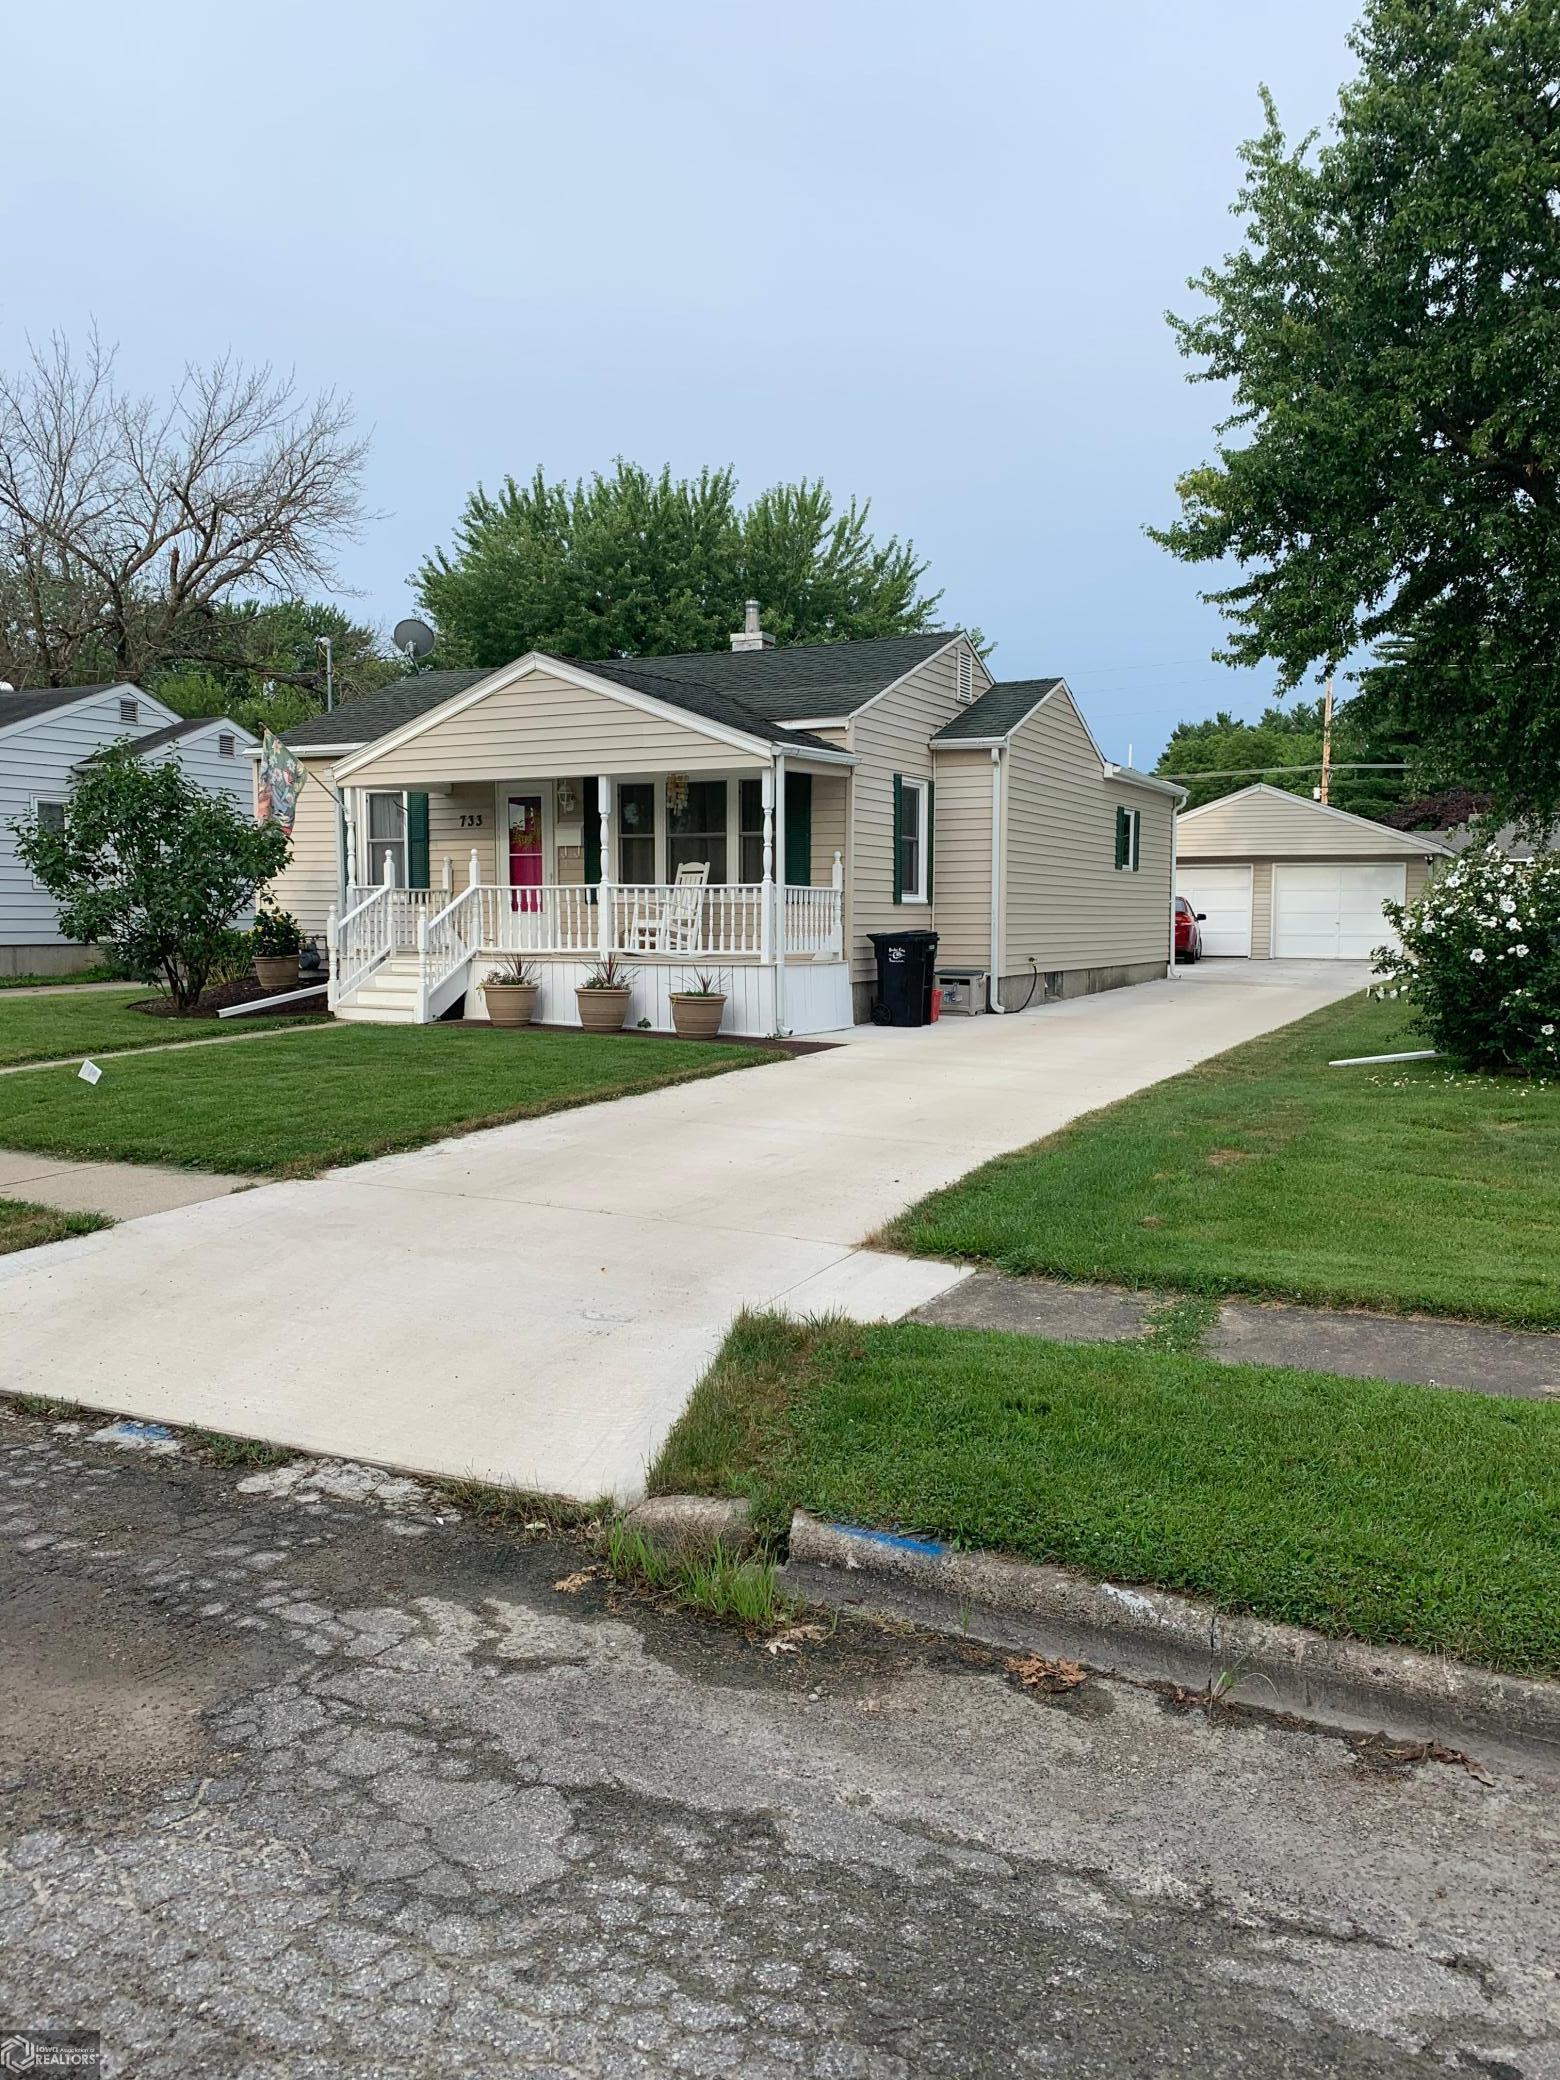 733 Grace Property Photo - Ottumwa, IA real estate listing